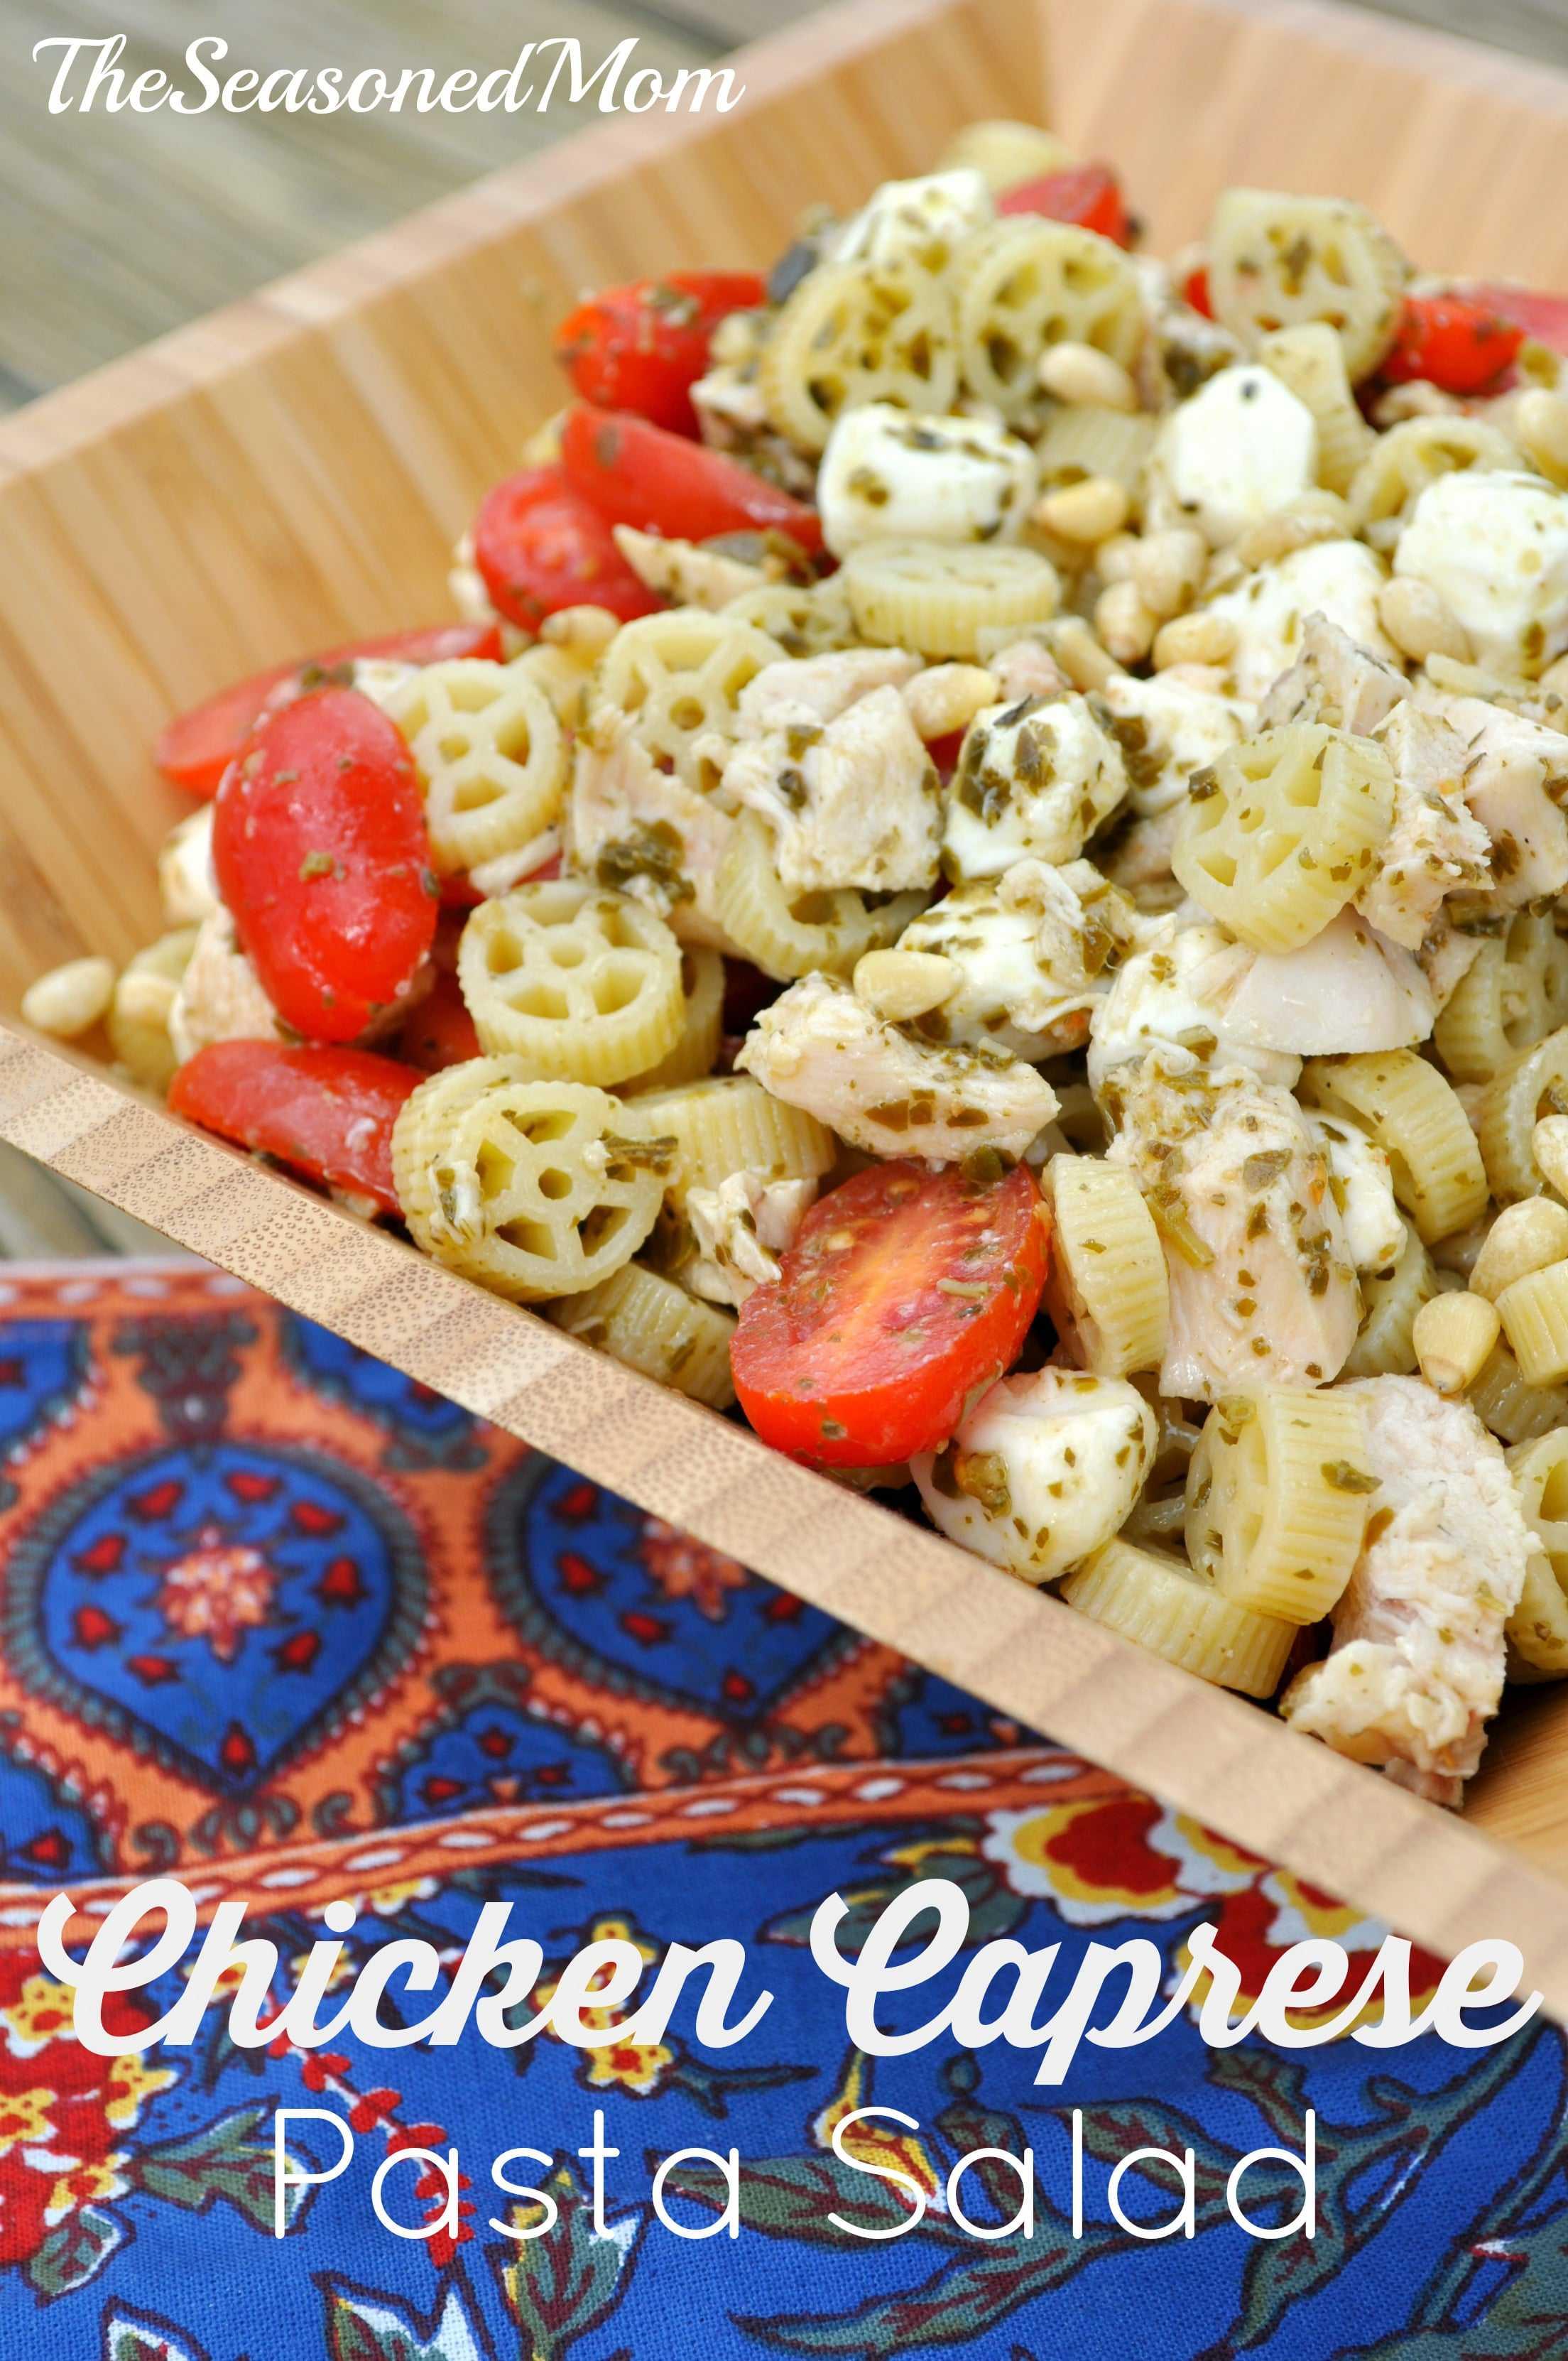 Chicken Caprese Pasta Salad - The Seasoned Mom